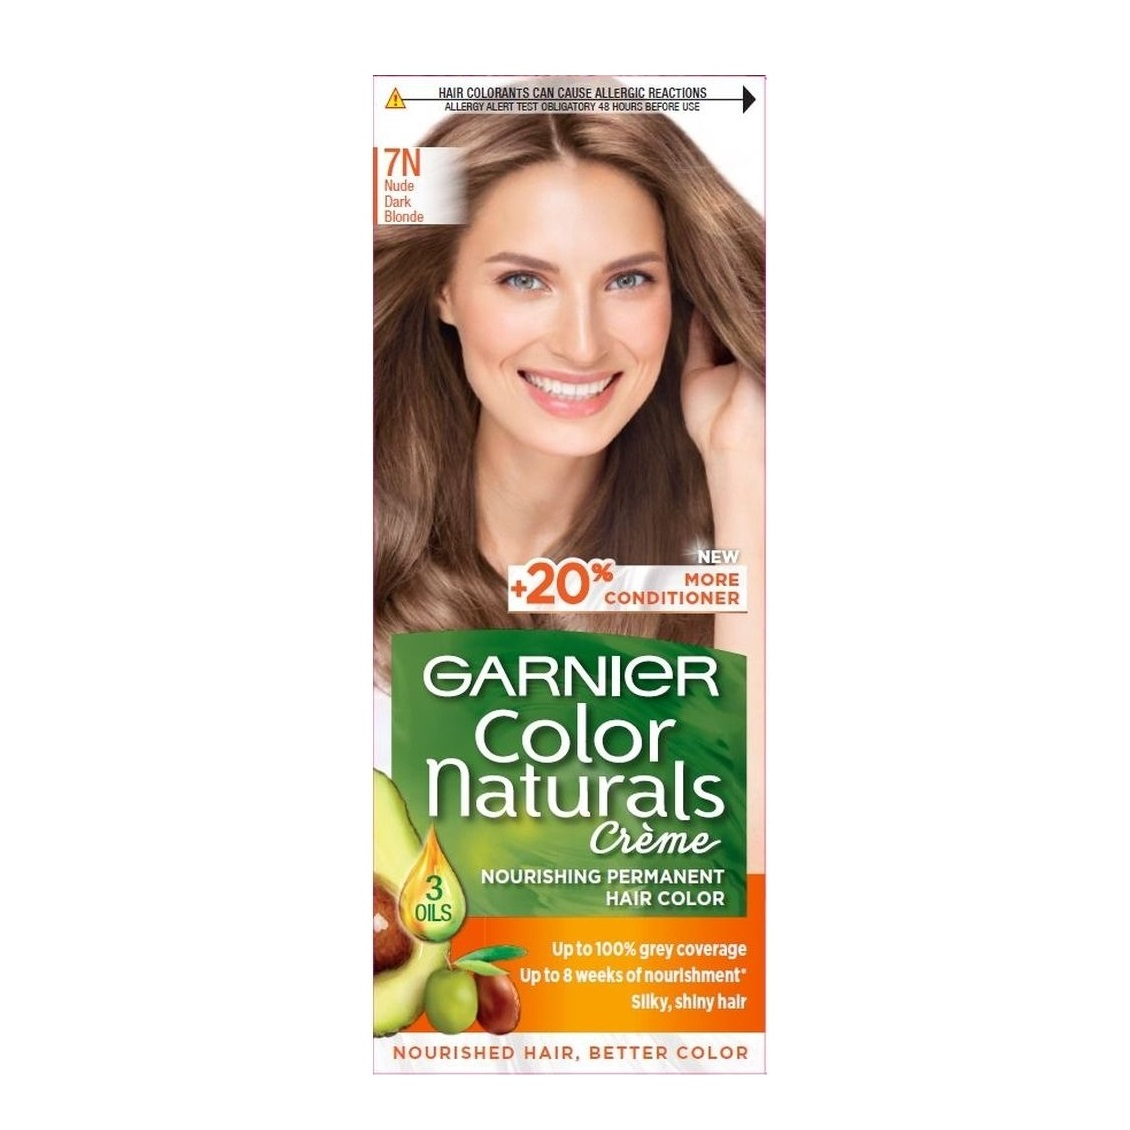 کیت رنگ مو گارنیر سری Color Naturals شماره 7N